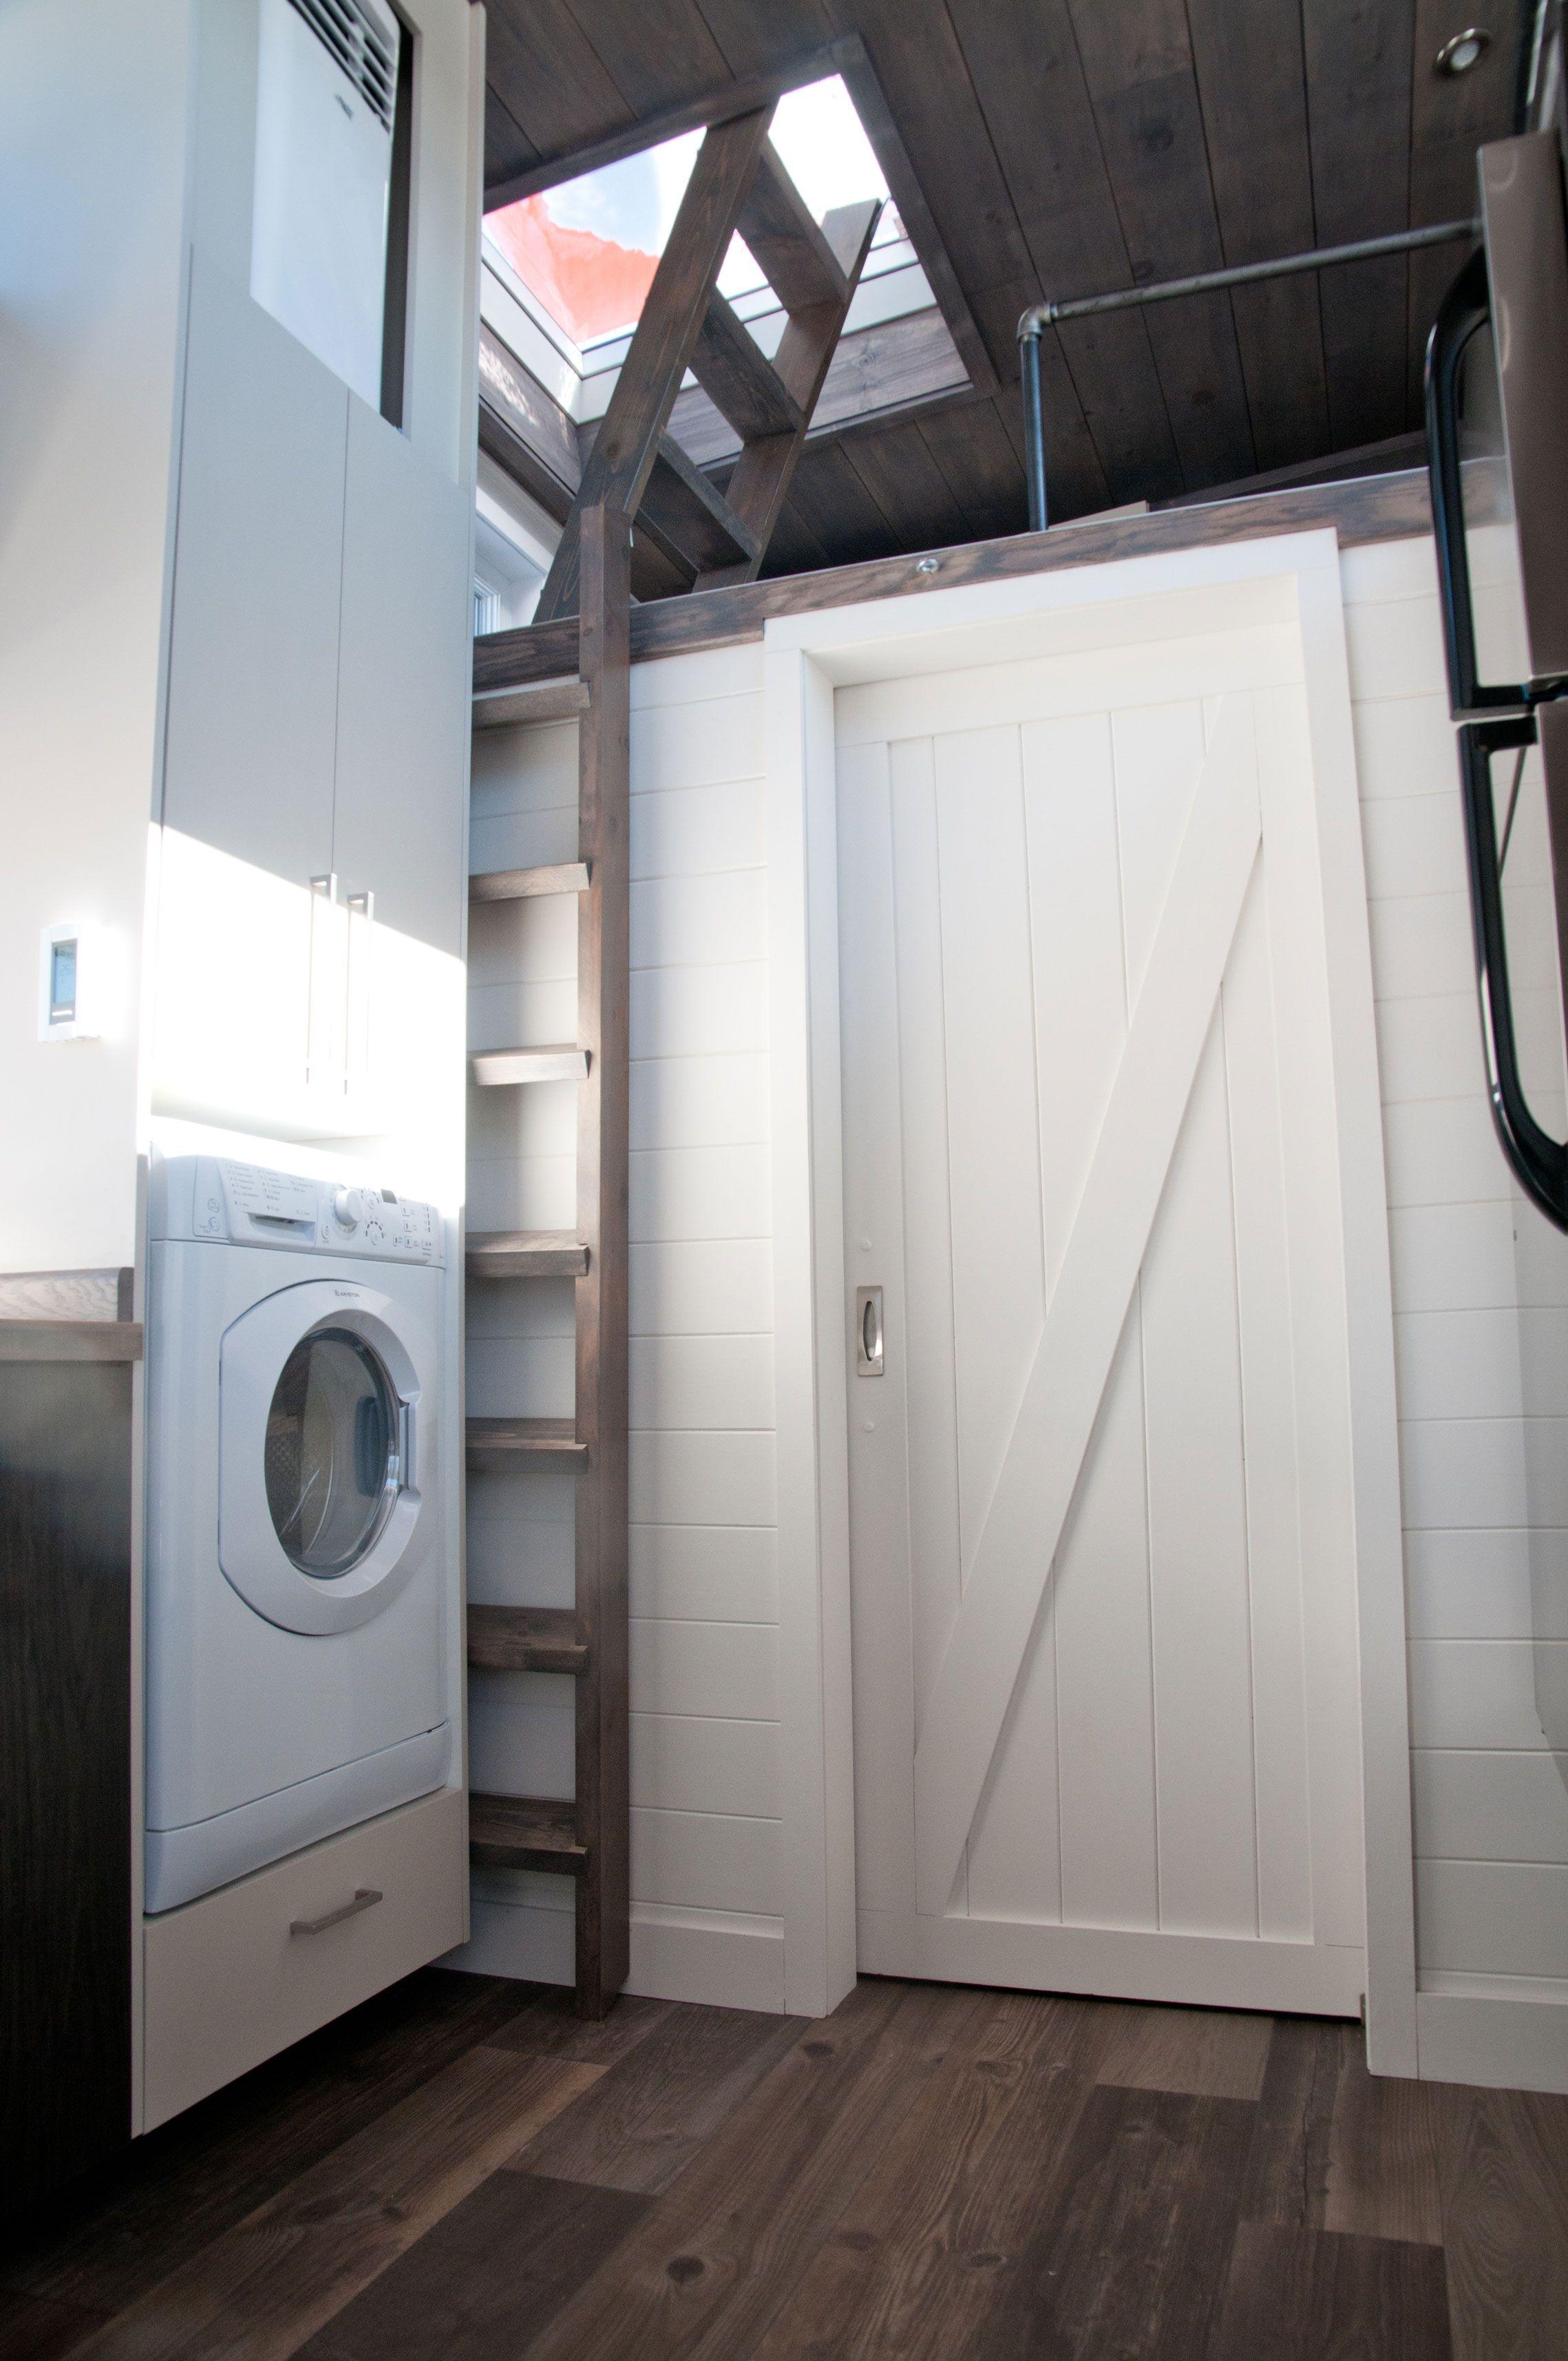 explore tiny house on wheels tiny bathrooms and more - Tiny House Appliances